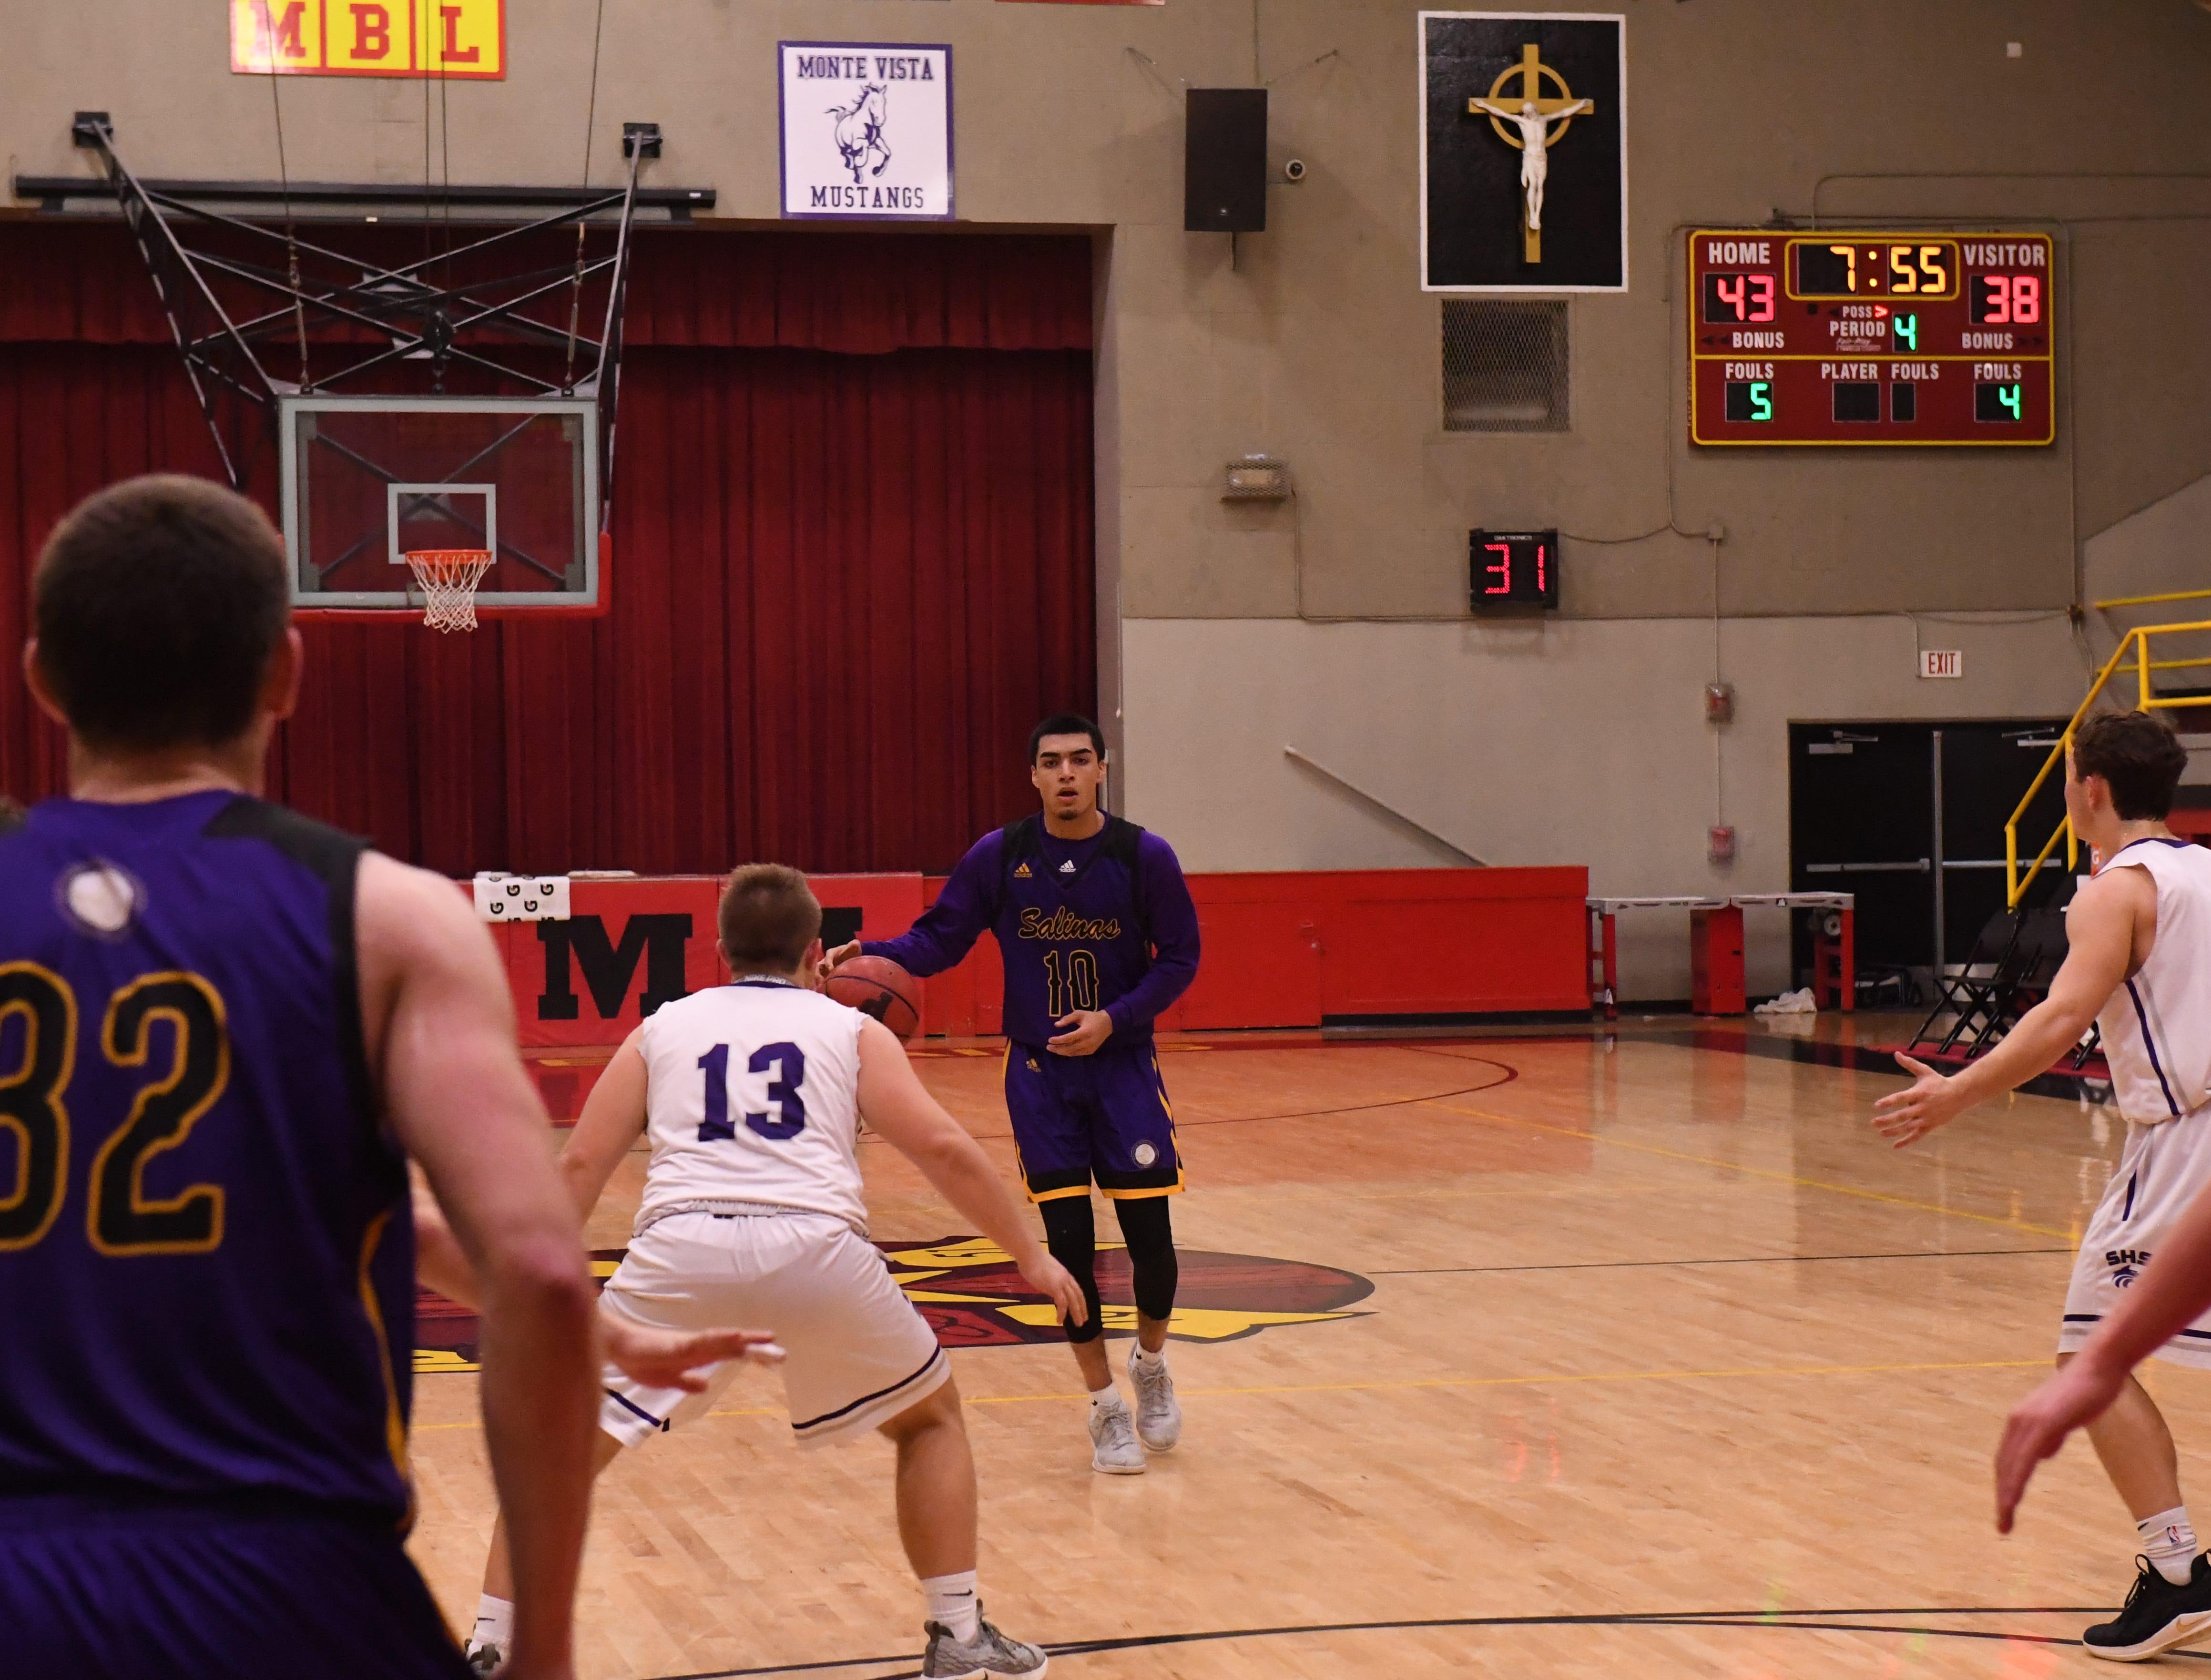 Salinas guard AJ Saldana (10) surveys the defense before calling a play.